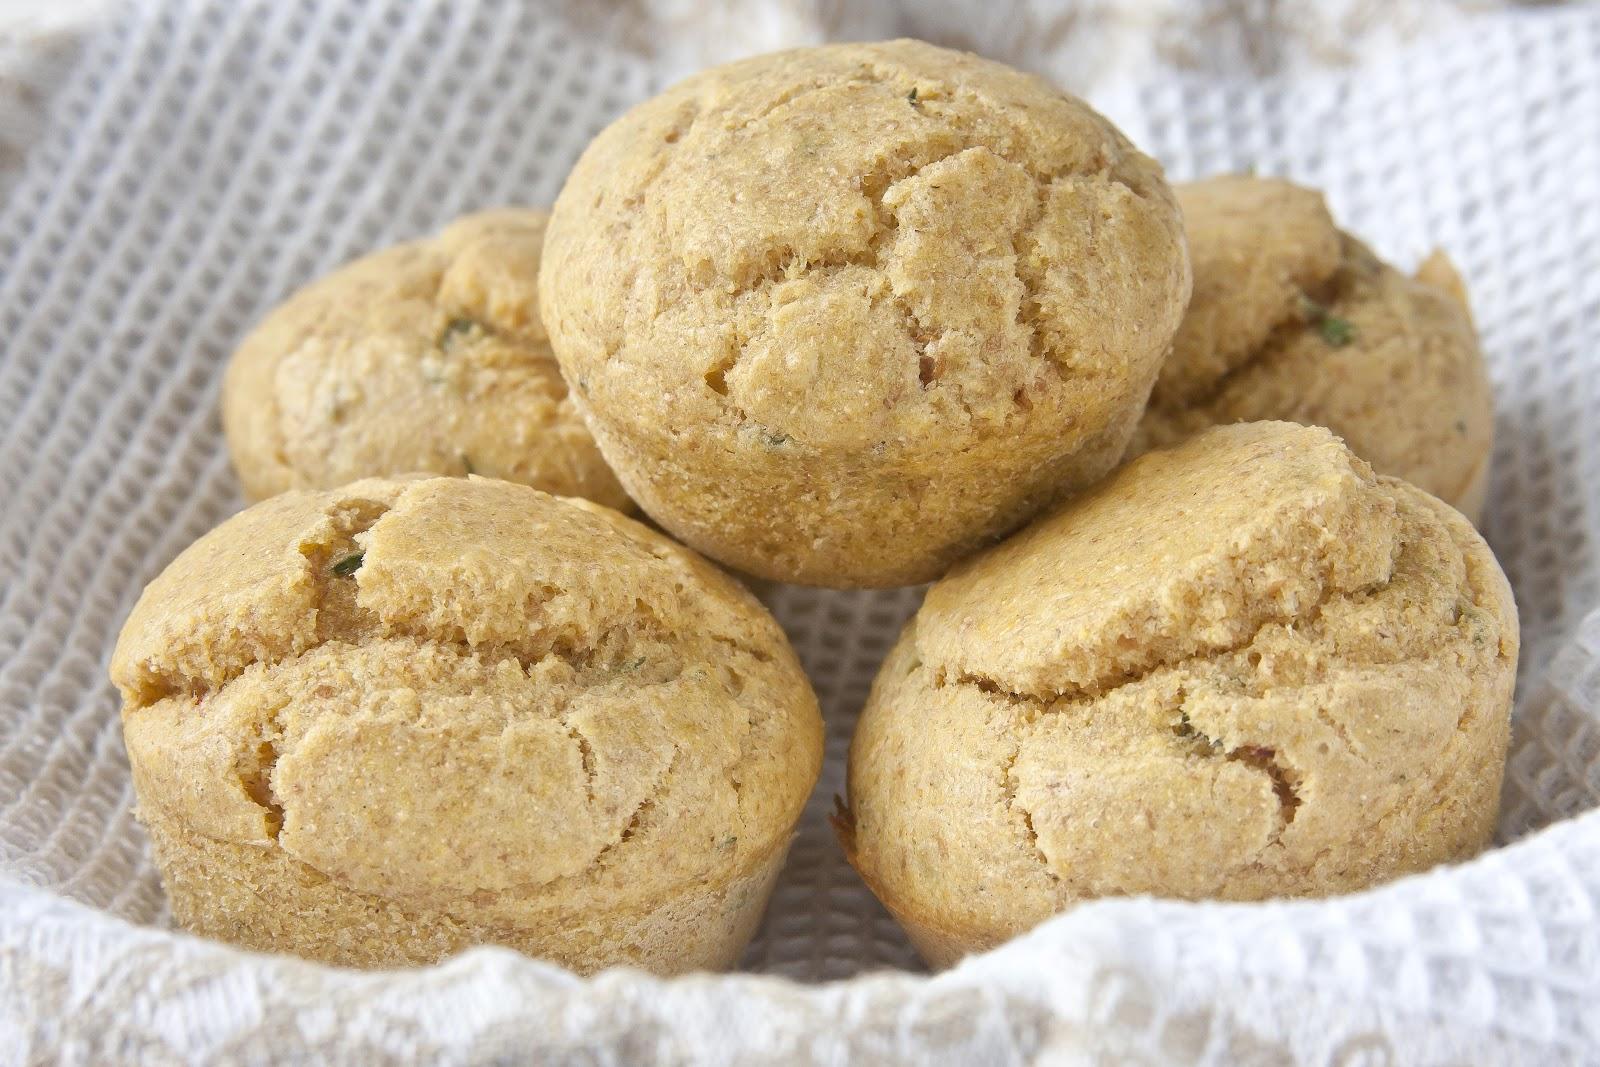 Muffin Tin Mania: Olive Oil Chipotle Muffins